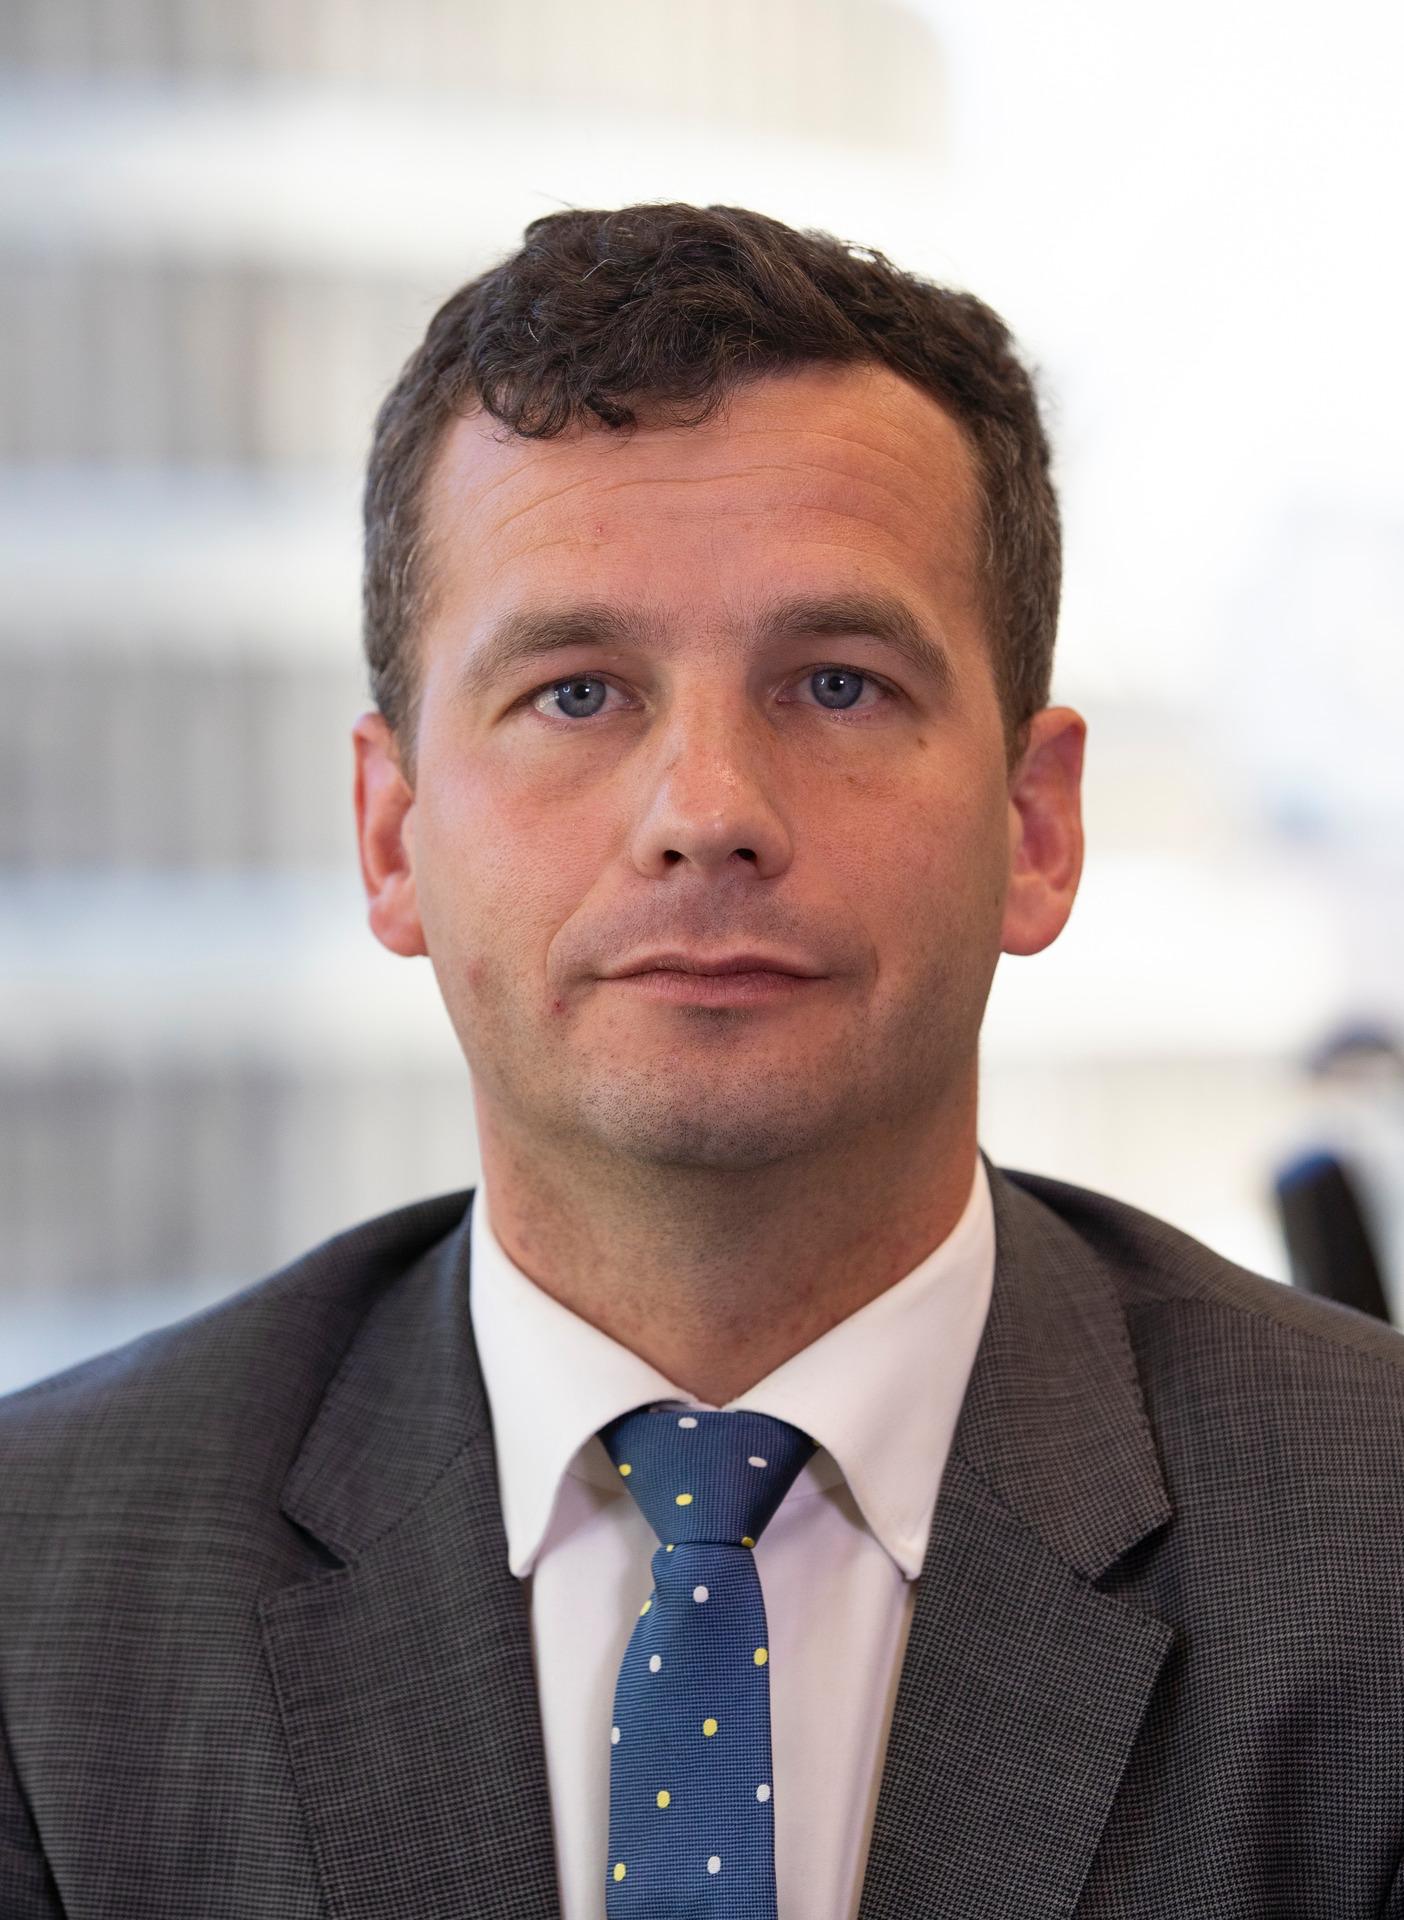 Act Leader David Seymour: Kiwis need to resist an 'Orwellian future'